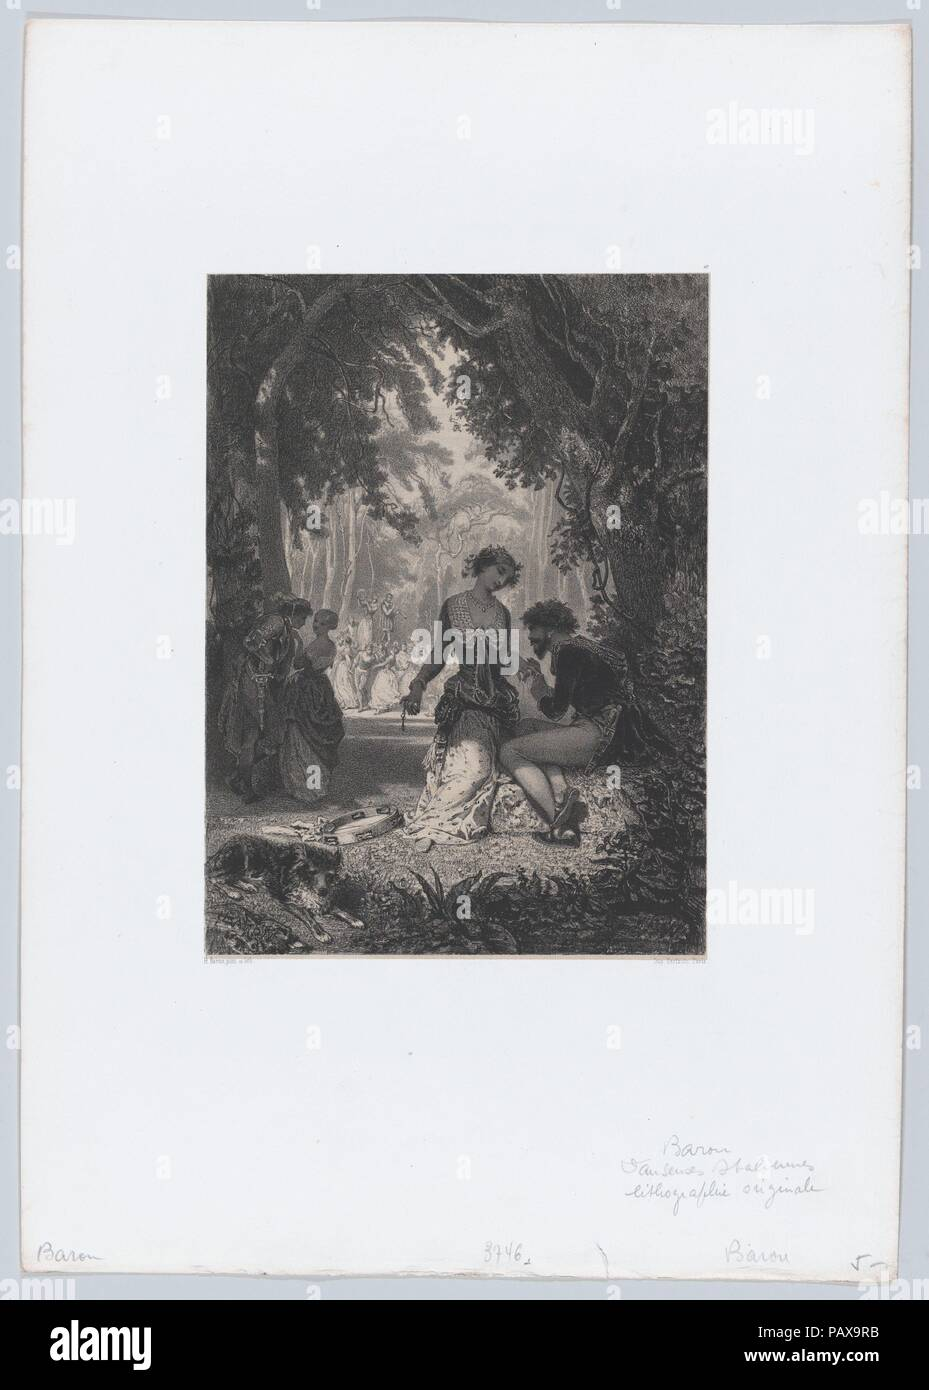 Love Sermons. Artist: Henri-Charles-Antoine Baron (French, Besançon 1816-1885 Geneva). Dimensions: Sheet: 17 5/8 × 12 5/16 in. (44.8 × 31.3 cm)  Image: 9 9/16 in. × 7 in. (24.3 × 17.8 cm). Printer: Bertauts. Series/Portfolio: Les Artistes Contemporains. Date: 1853. Museum: Metropolitan Museum of Art, New York, USA. - Stock Image